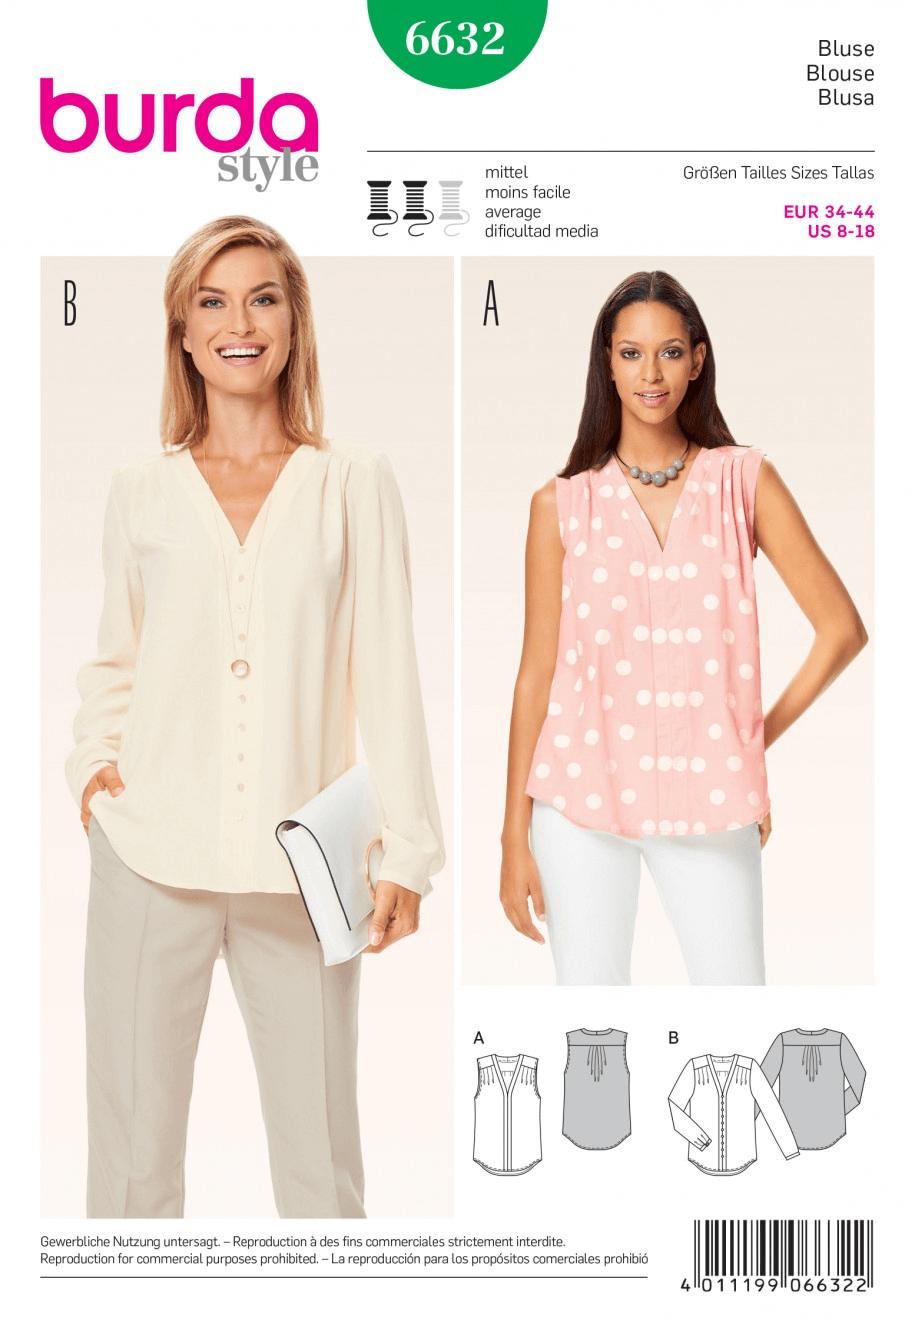 Misses Blouse Shirt Sleeveless or Long Sleeved Burda Sewing Pattern 6632